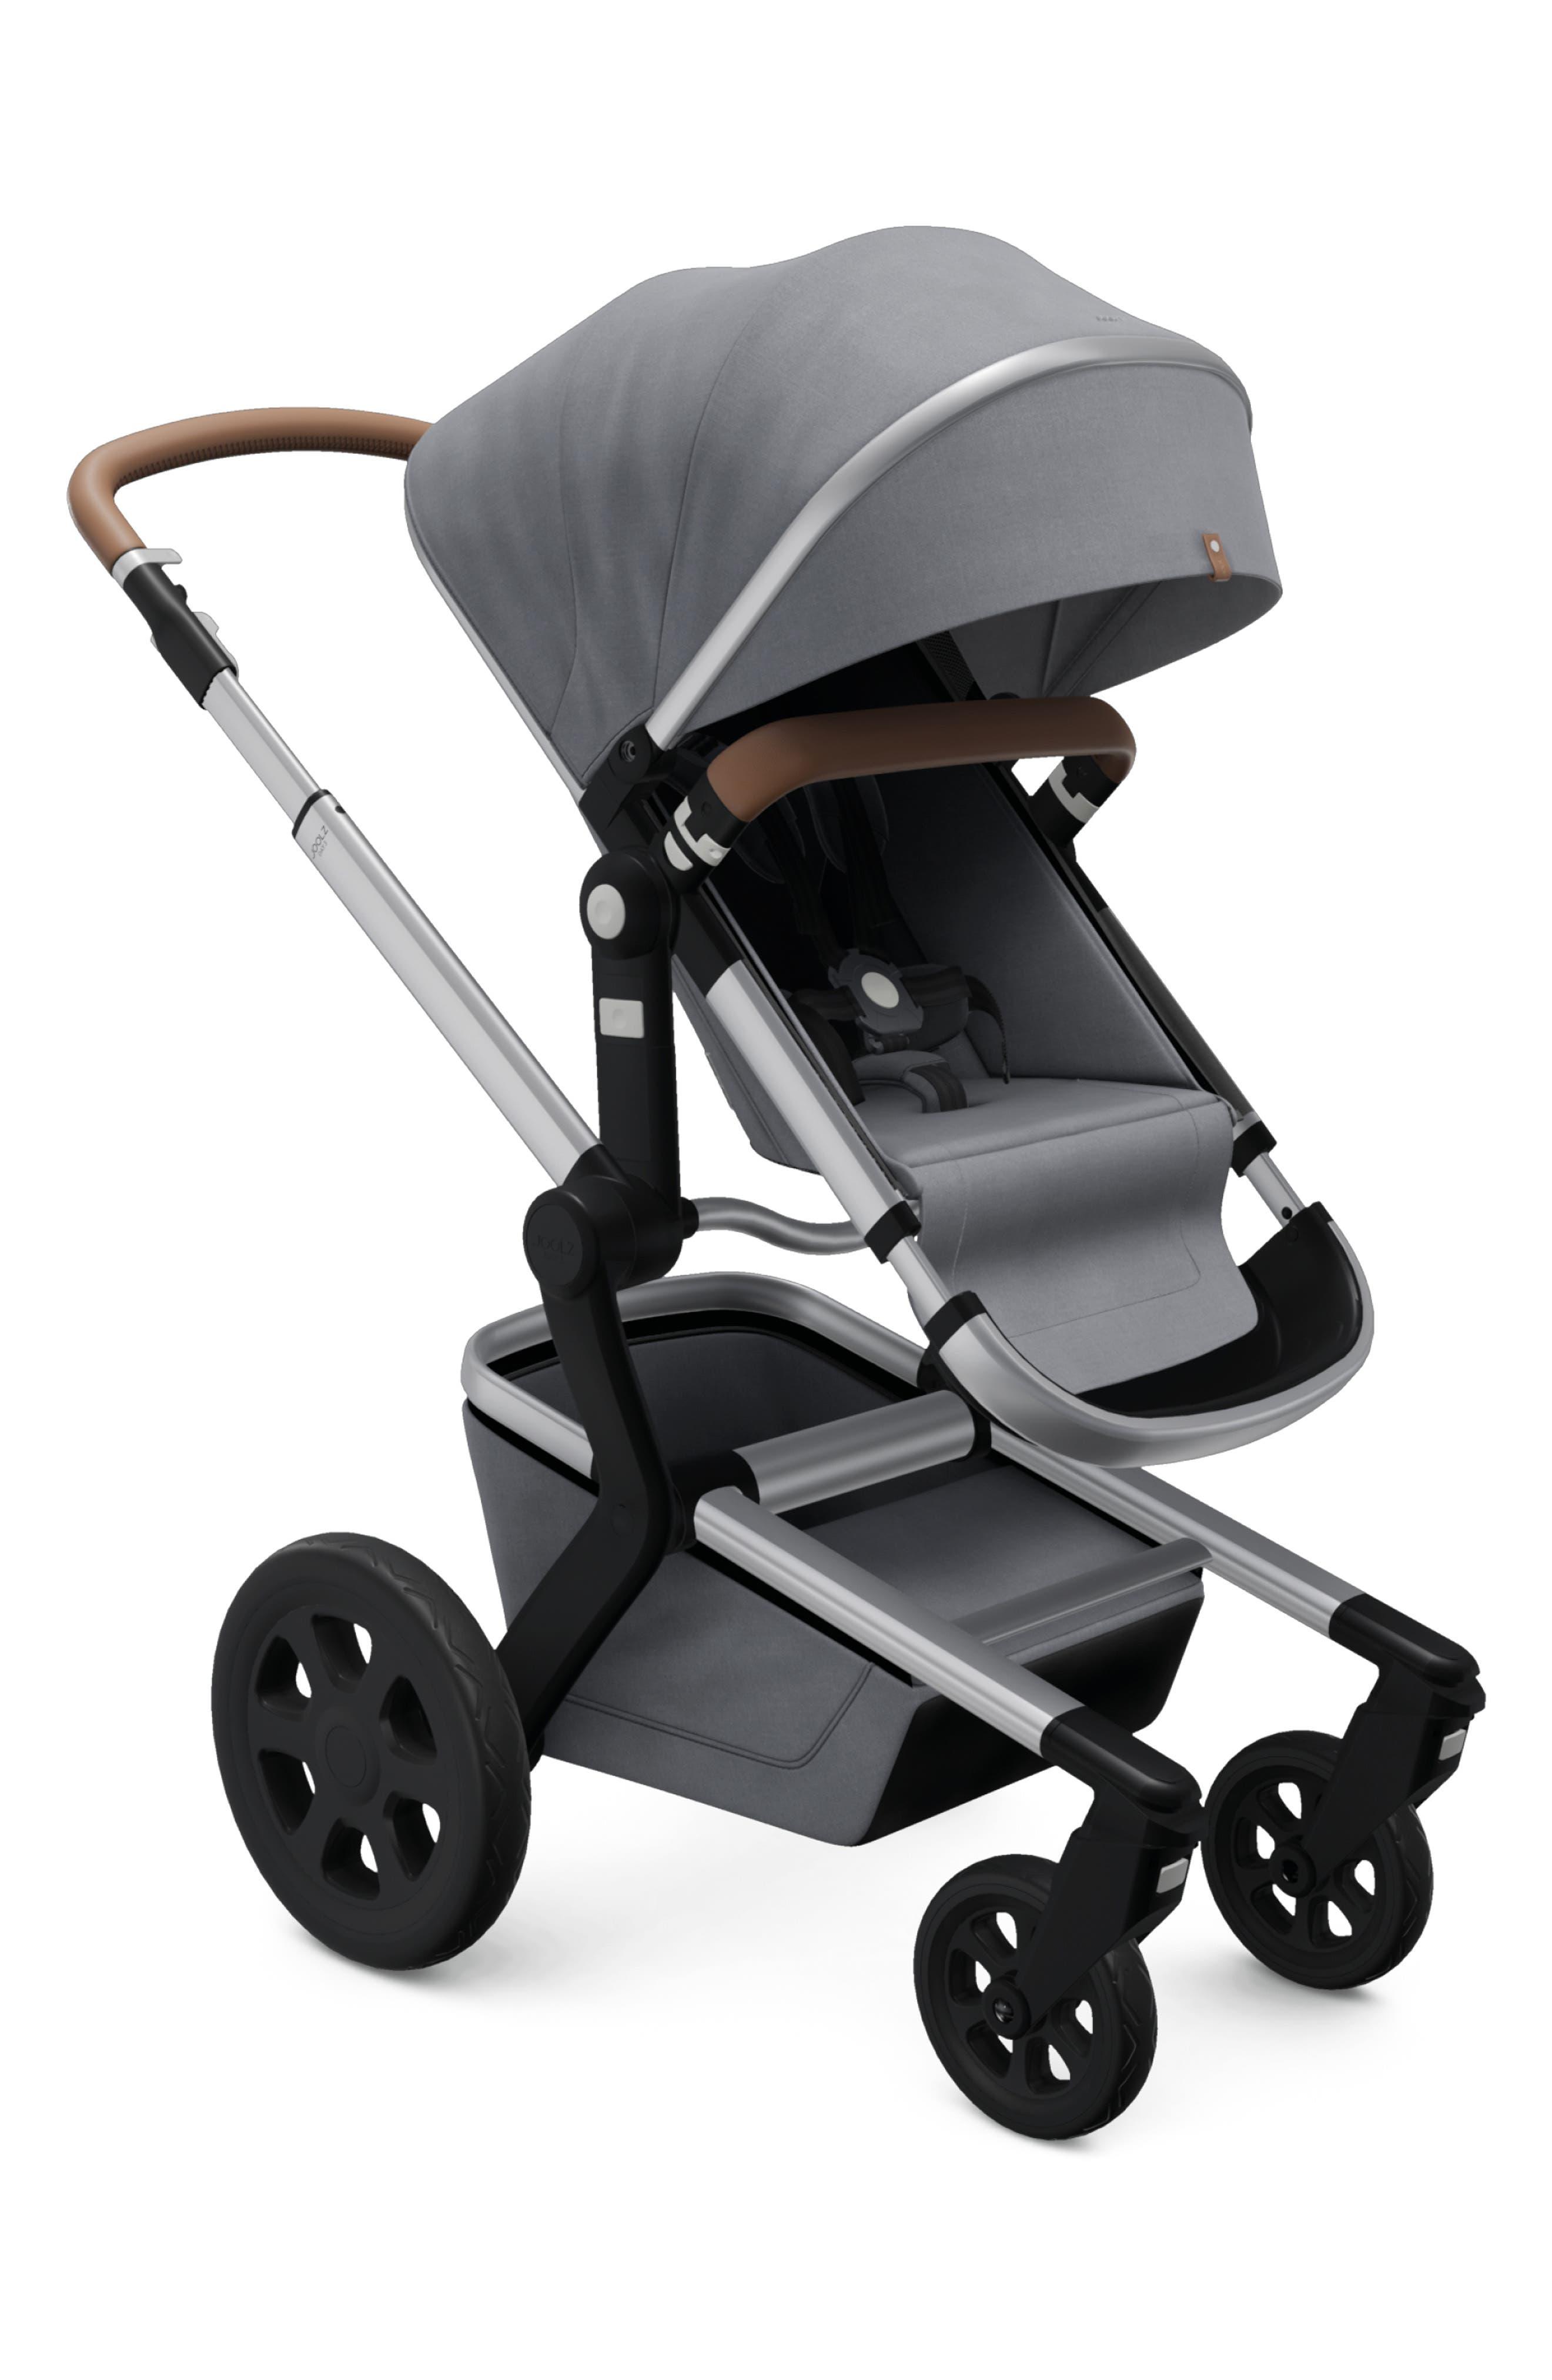 Infant Joolz Day3 Complete Stroller  Bassinet Size One Size  Grey